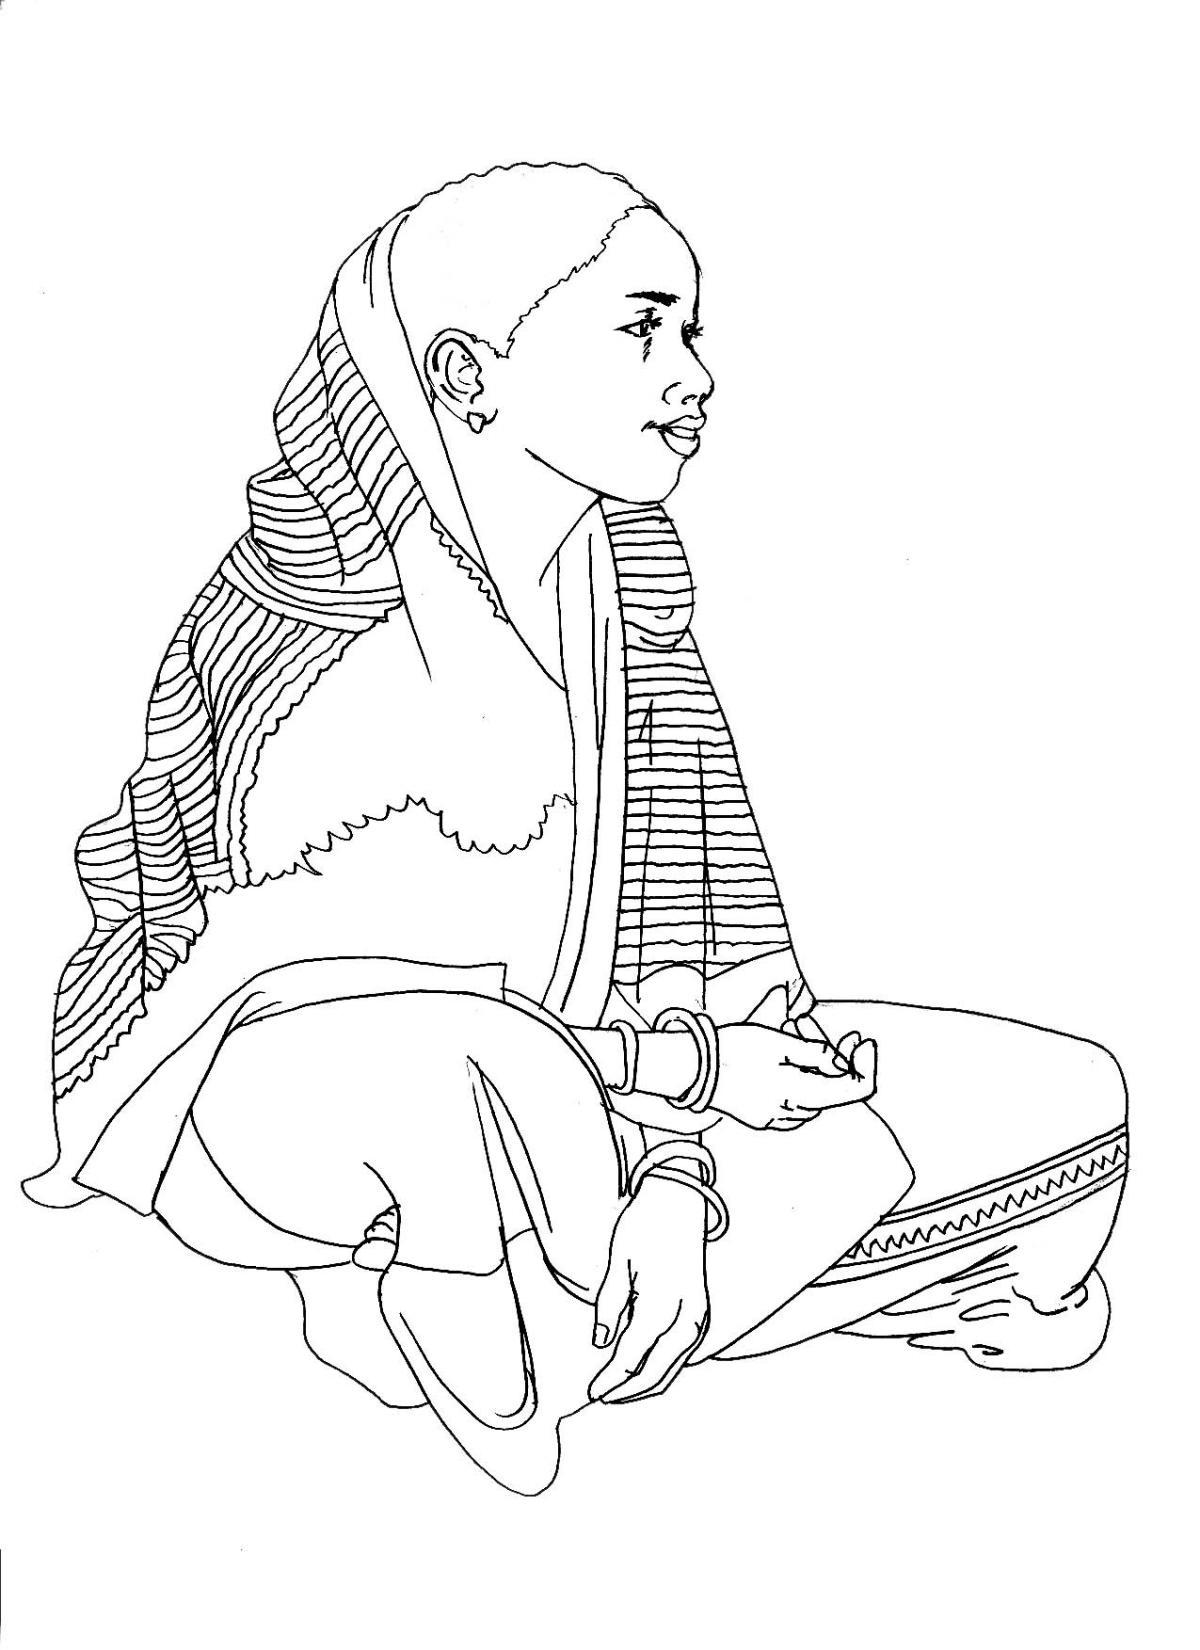 People - Woman sitting - 05 - India